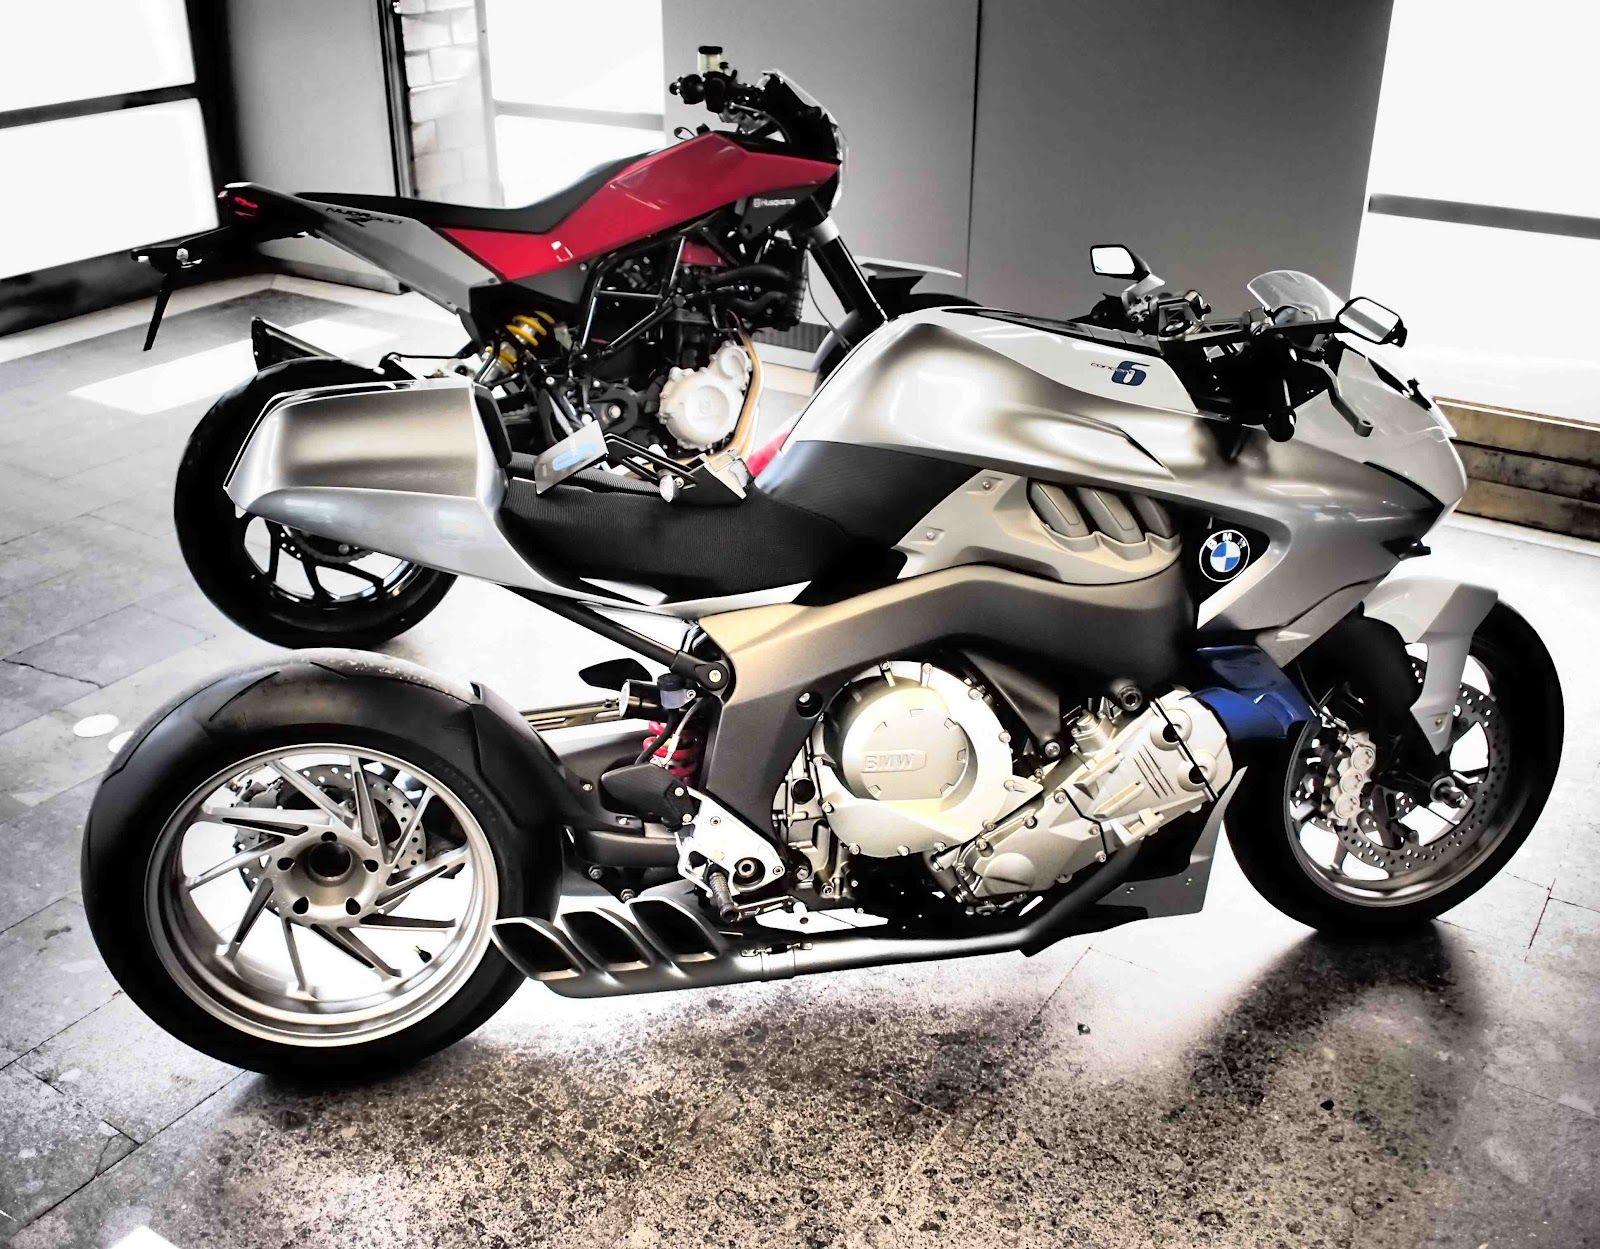 BMW Concept Cylinder Sports Husqvarna Moab Concept Bikes - 6 cylinder bmw